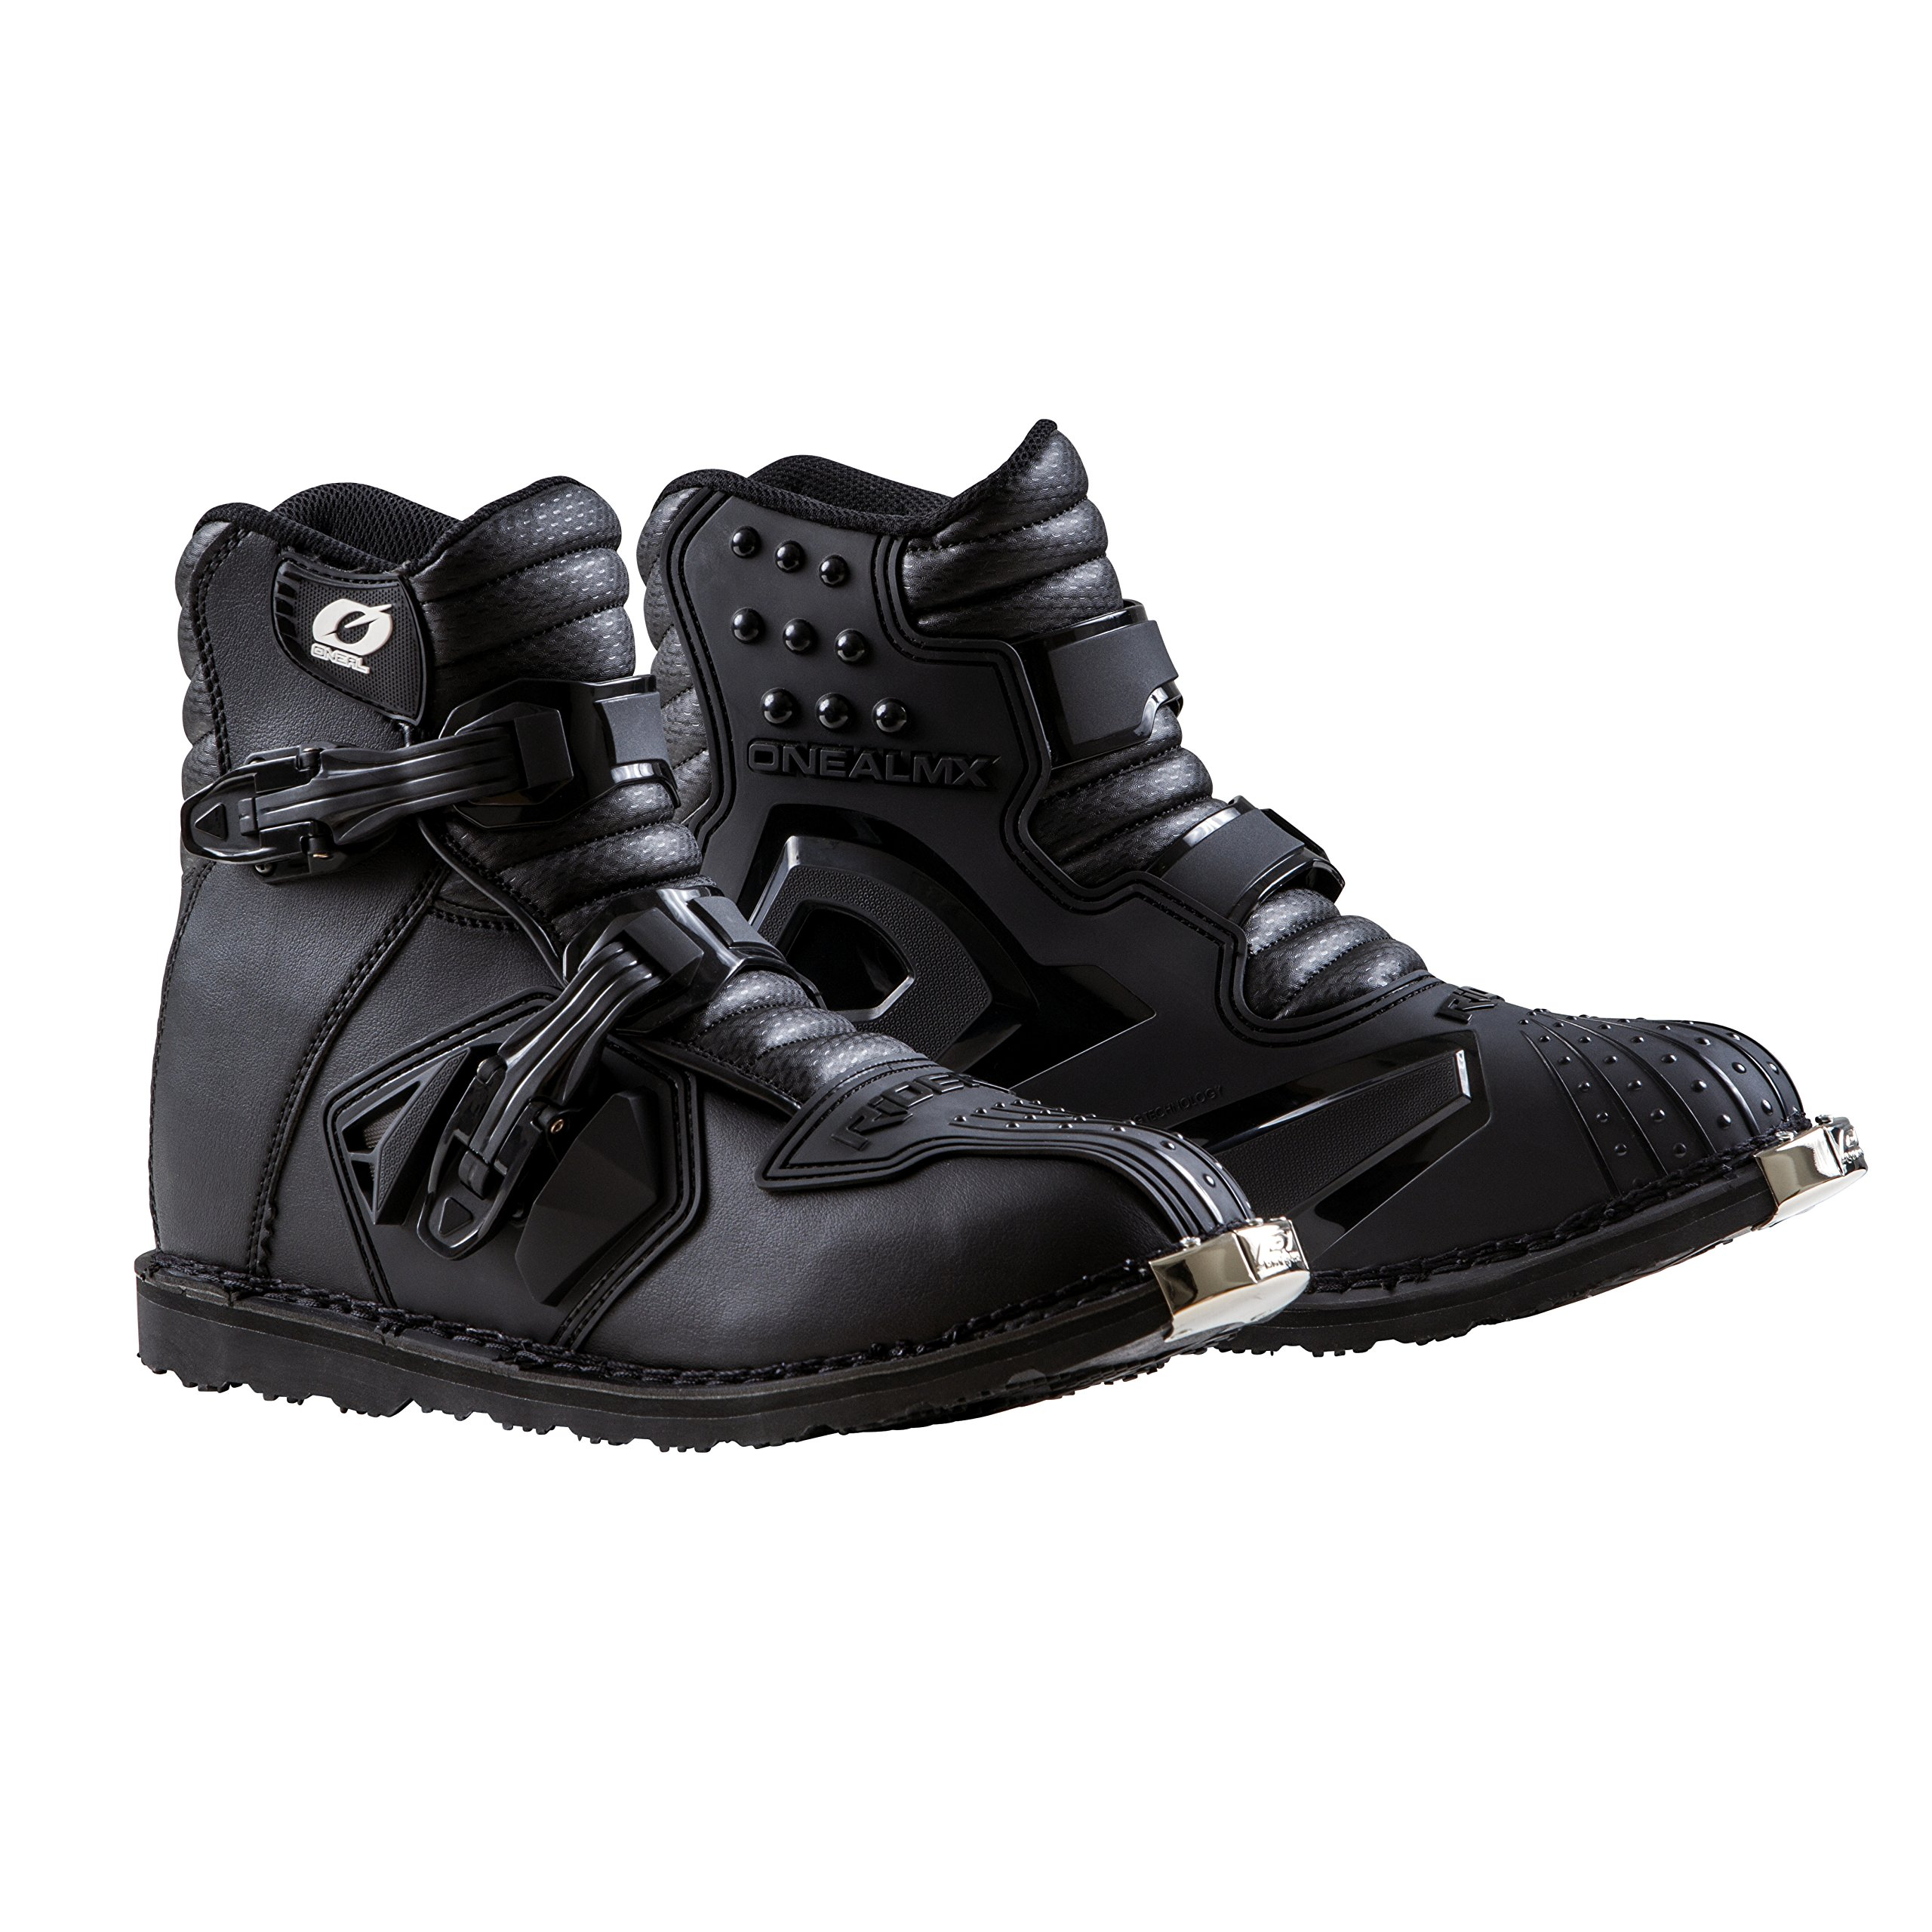 O'Neal 0344-011 Unisex-Adult Rider Shorty Boot (Black, Size 11)